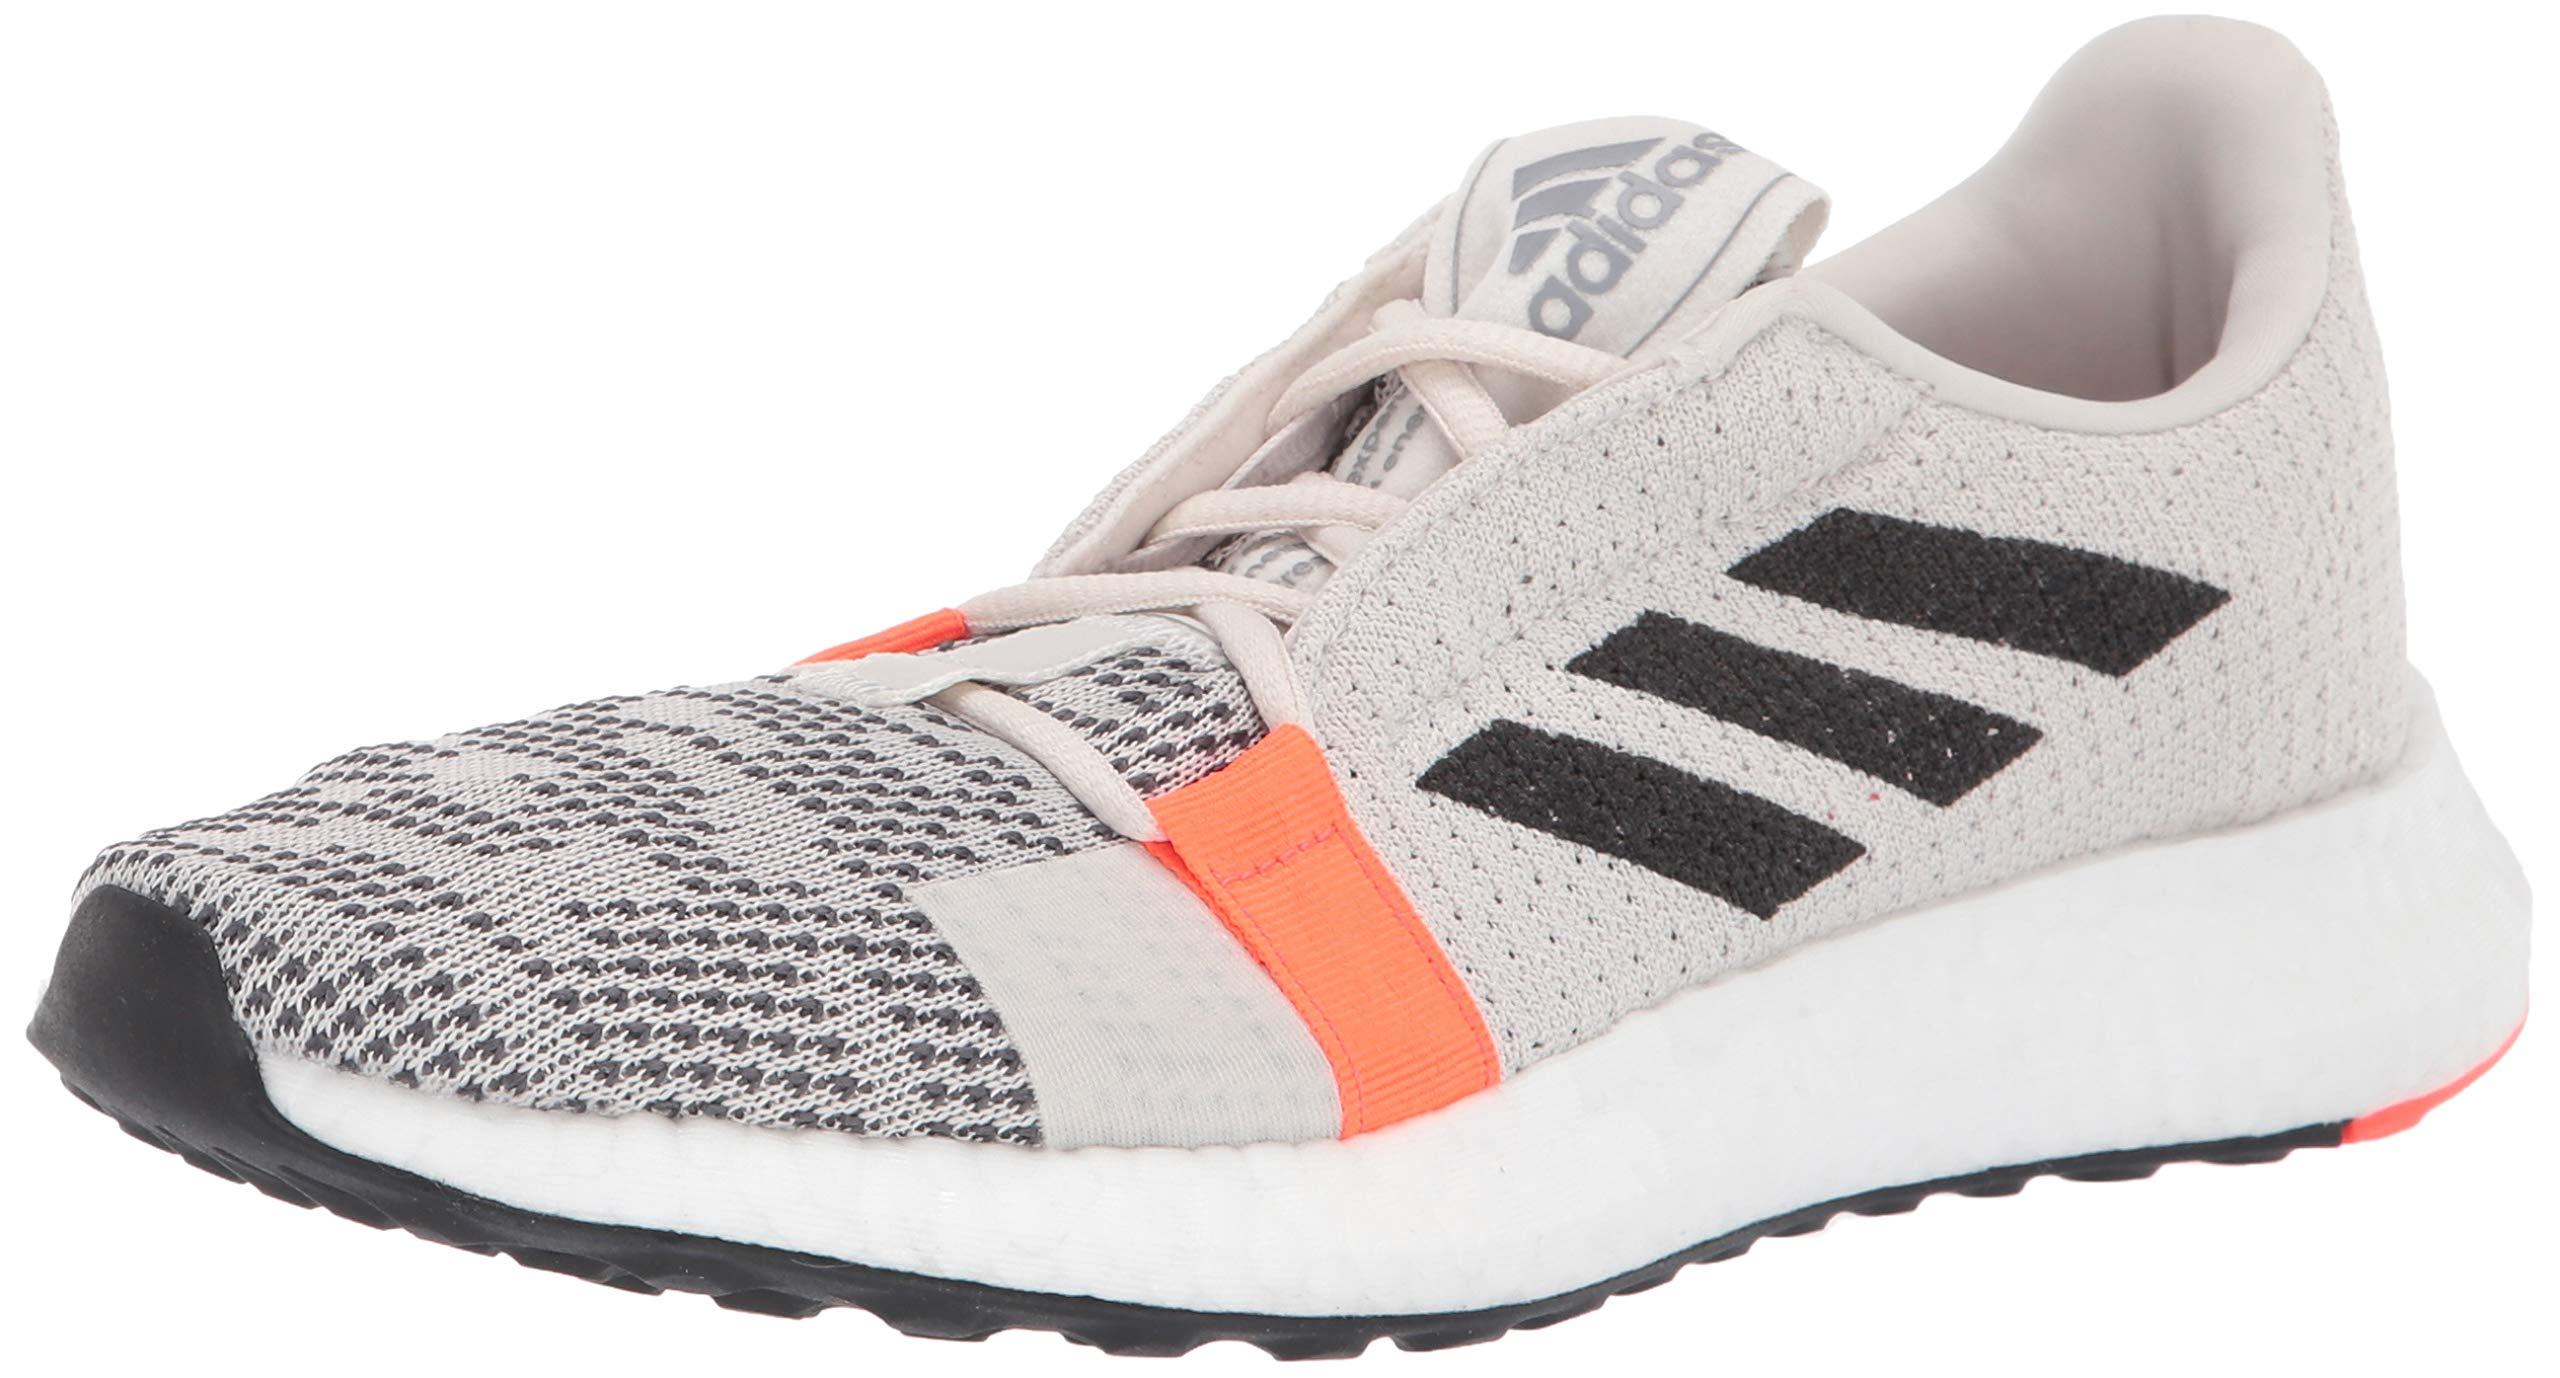 adidas Women's SenseBOOST GO Running Shoe, raw White/Black/Solar Red, 5 M US